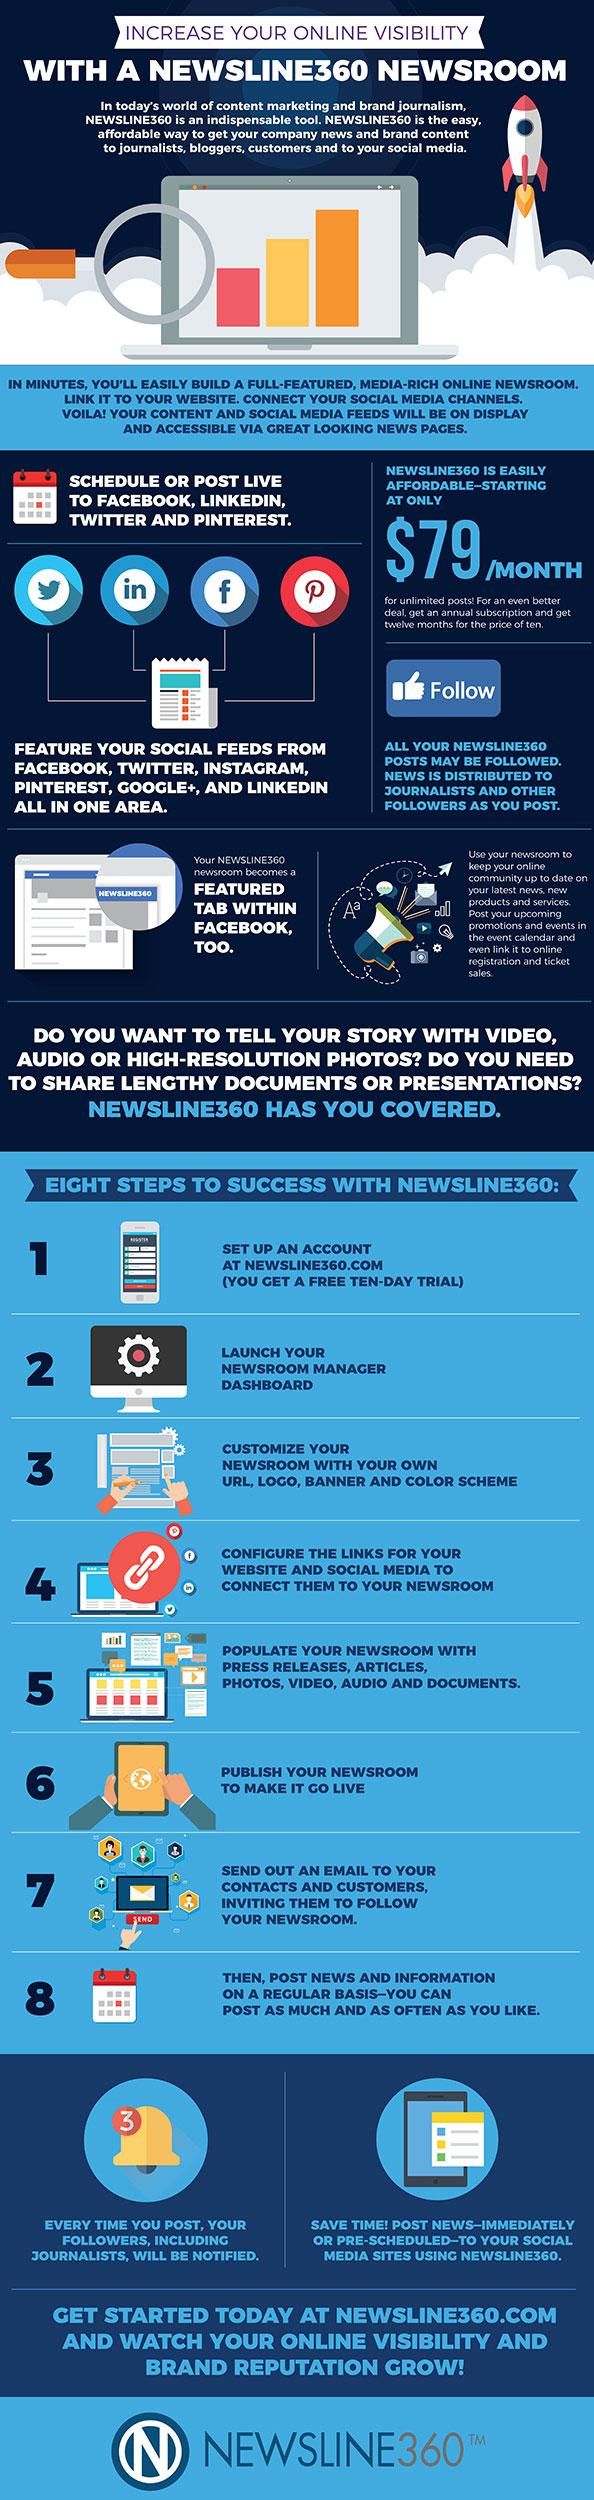 newsline360 newsrooms for companies